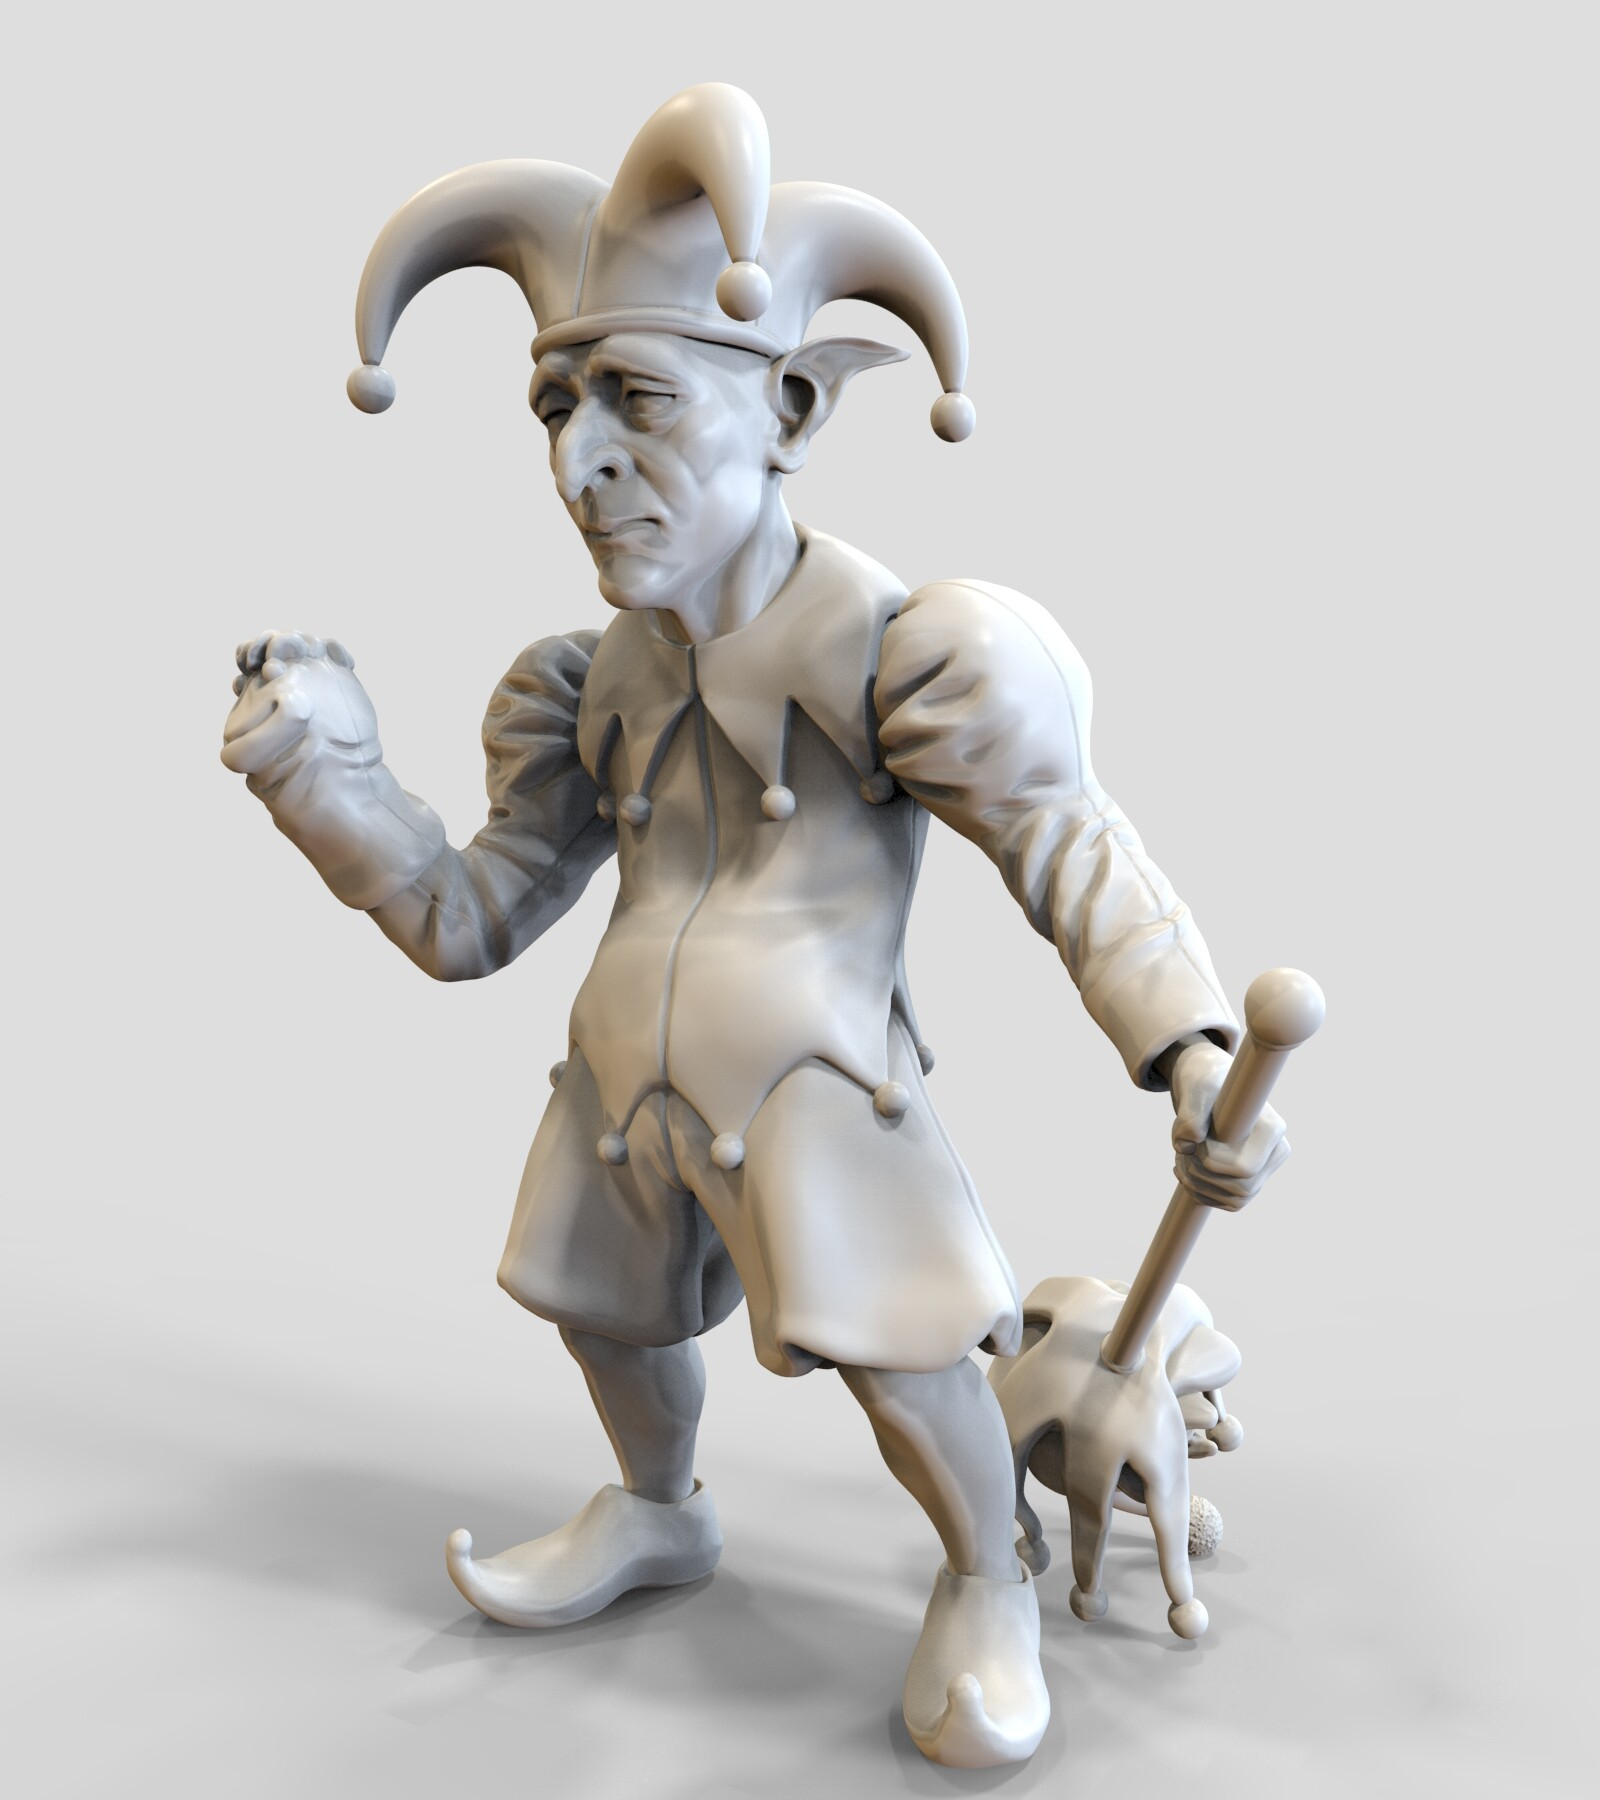 Andre de souza goblin jester 2